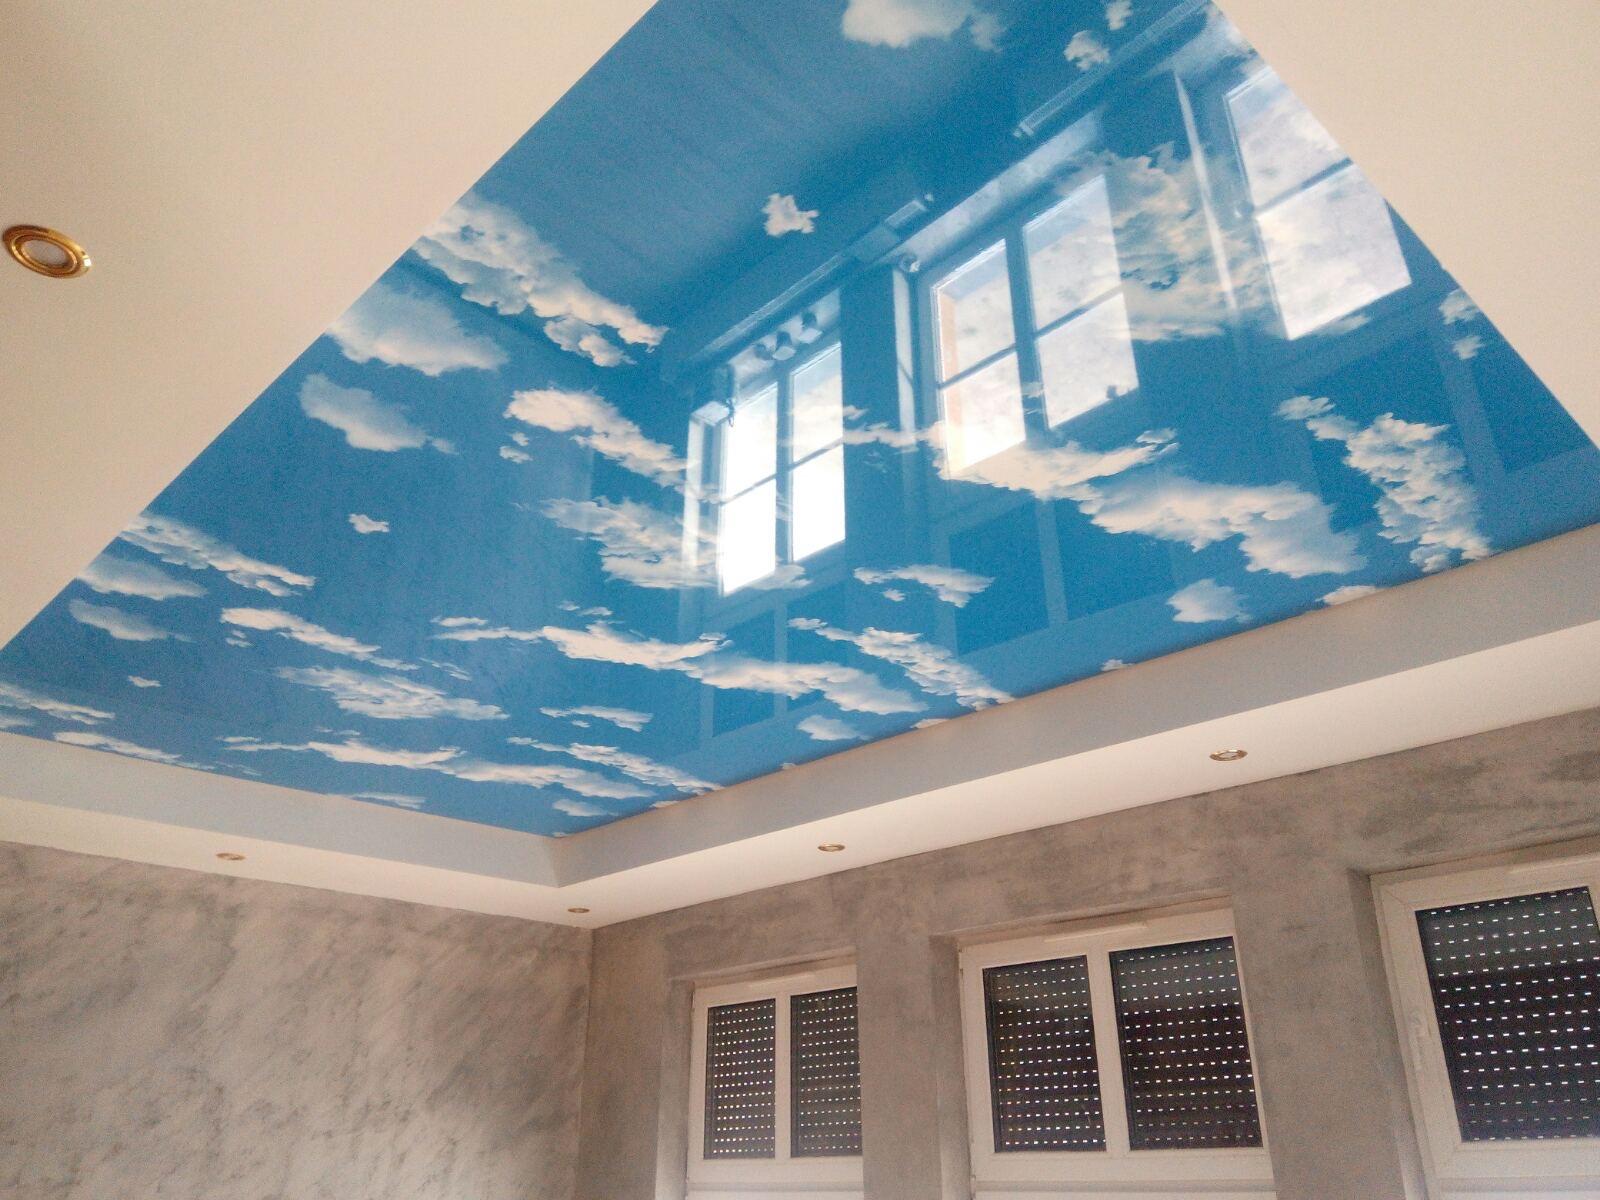 sufity napinane nadruk połysk niebo na suficie chmurki